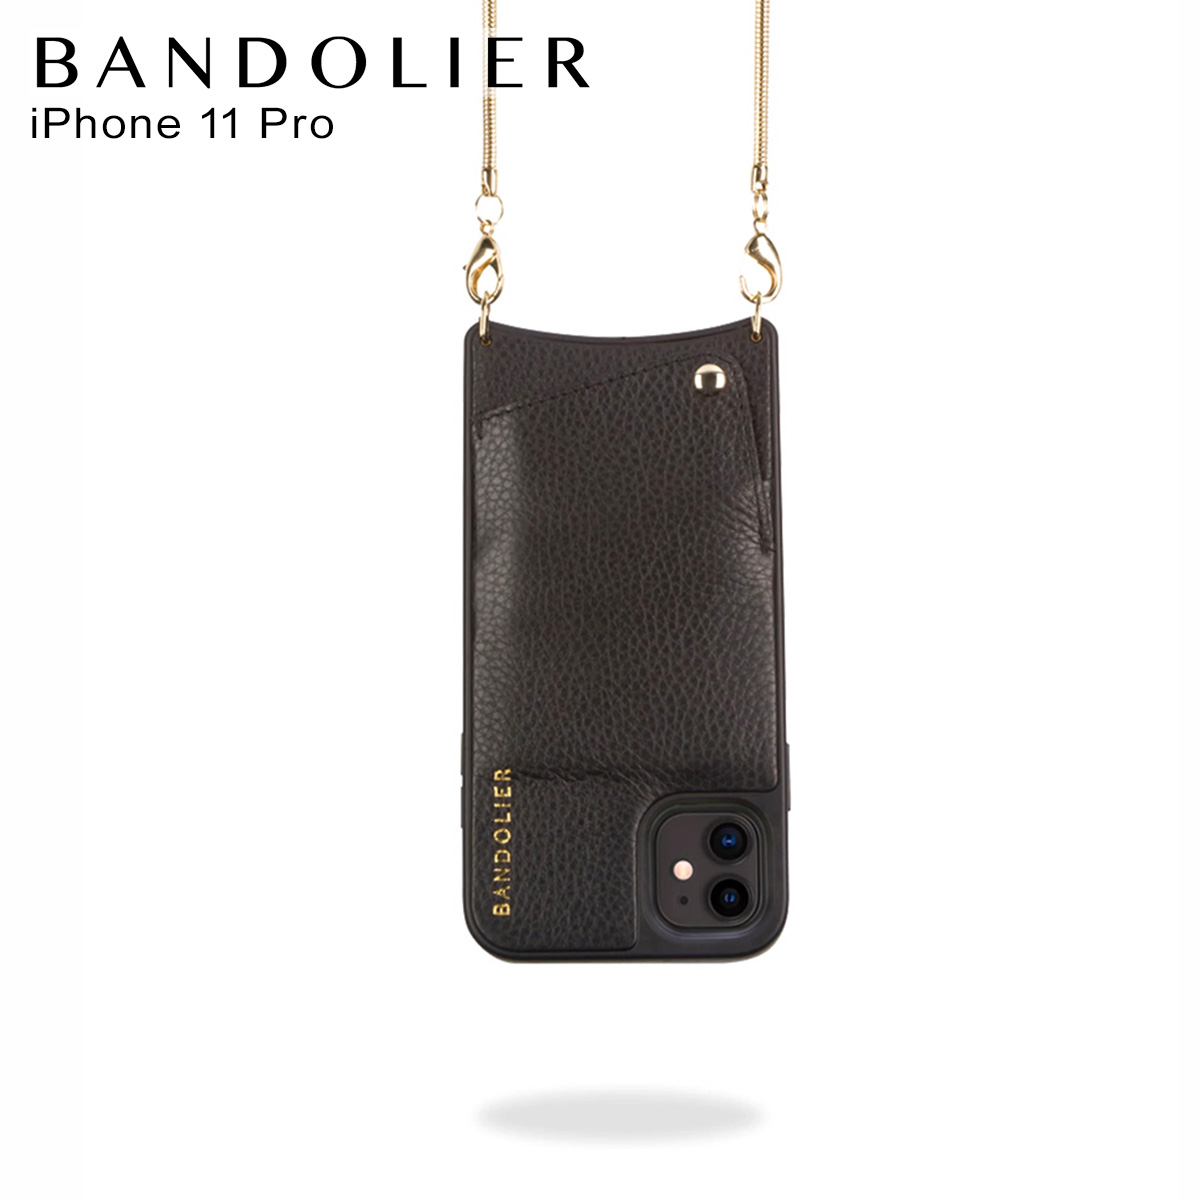 BANDOLIER BELINDA GOLD バンドリヤー ベリンダ ゴールド iPhone11 Pro ケース スマホ 携帯 ショルダー アイフォン メンズ レディース ブラック 黒 2002 [12月上旬 新入荷]